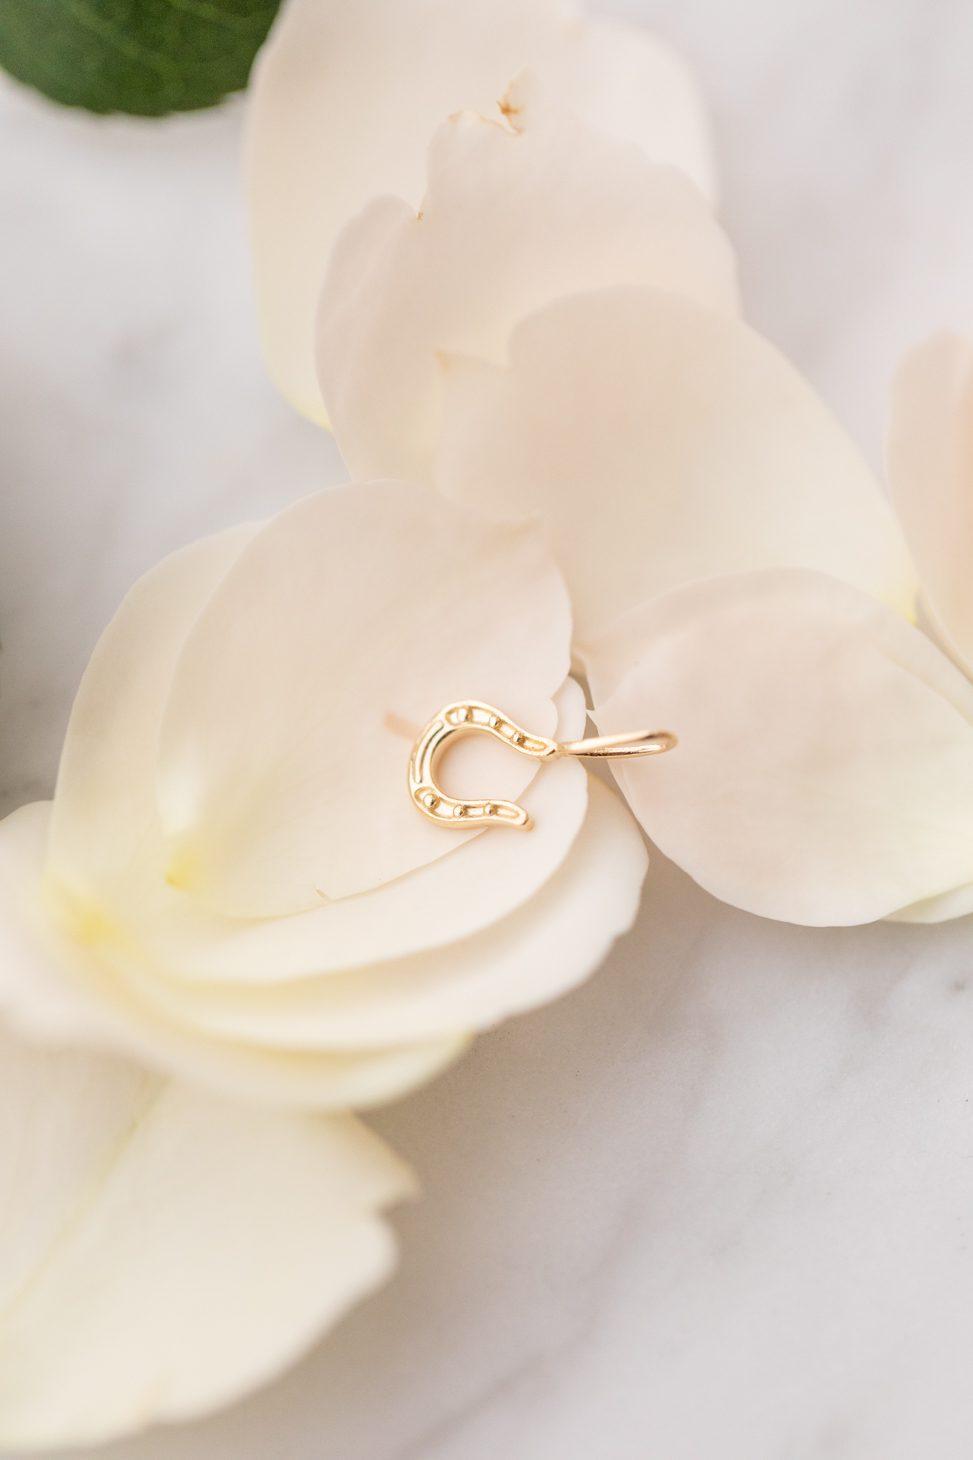 Melanie Auld Jewelry x Jillian Harris Latest Collaboration